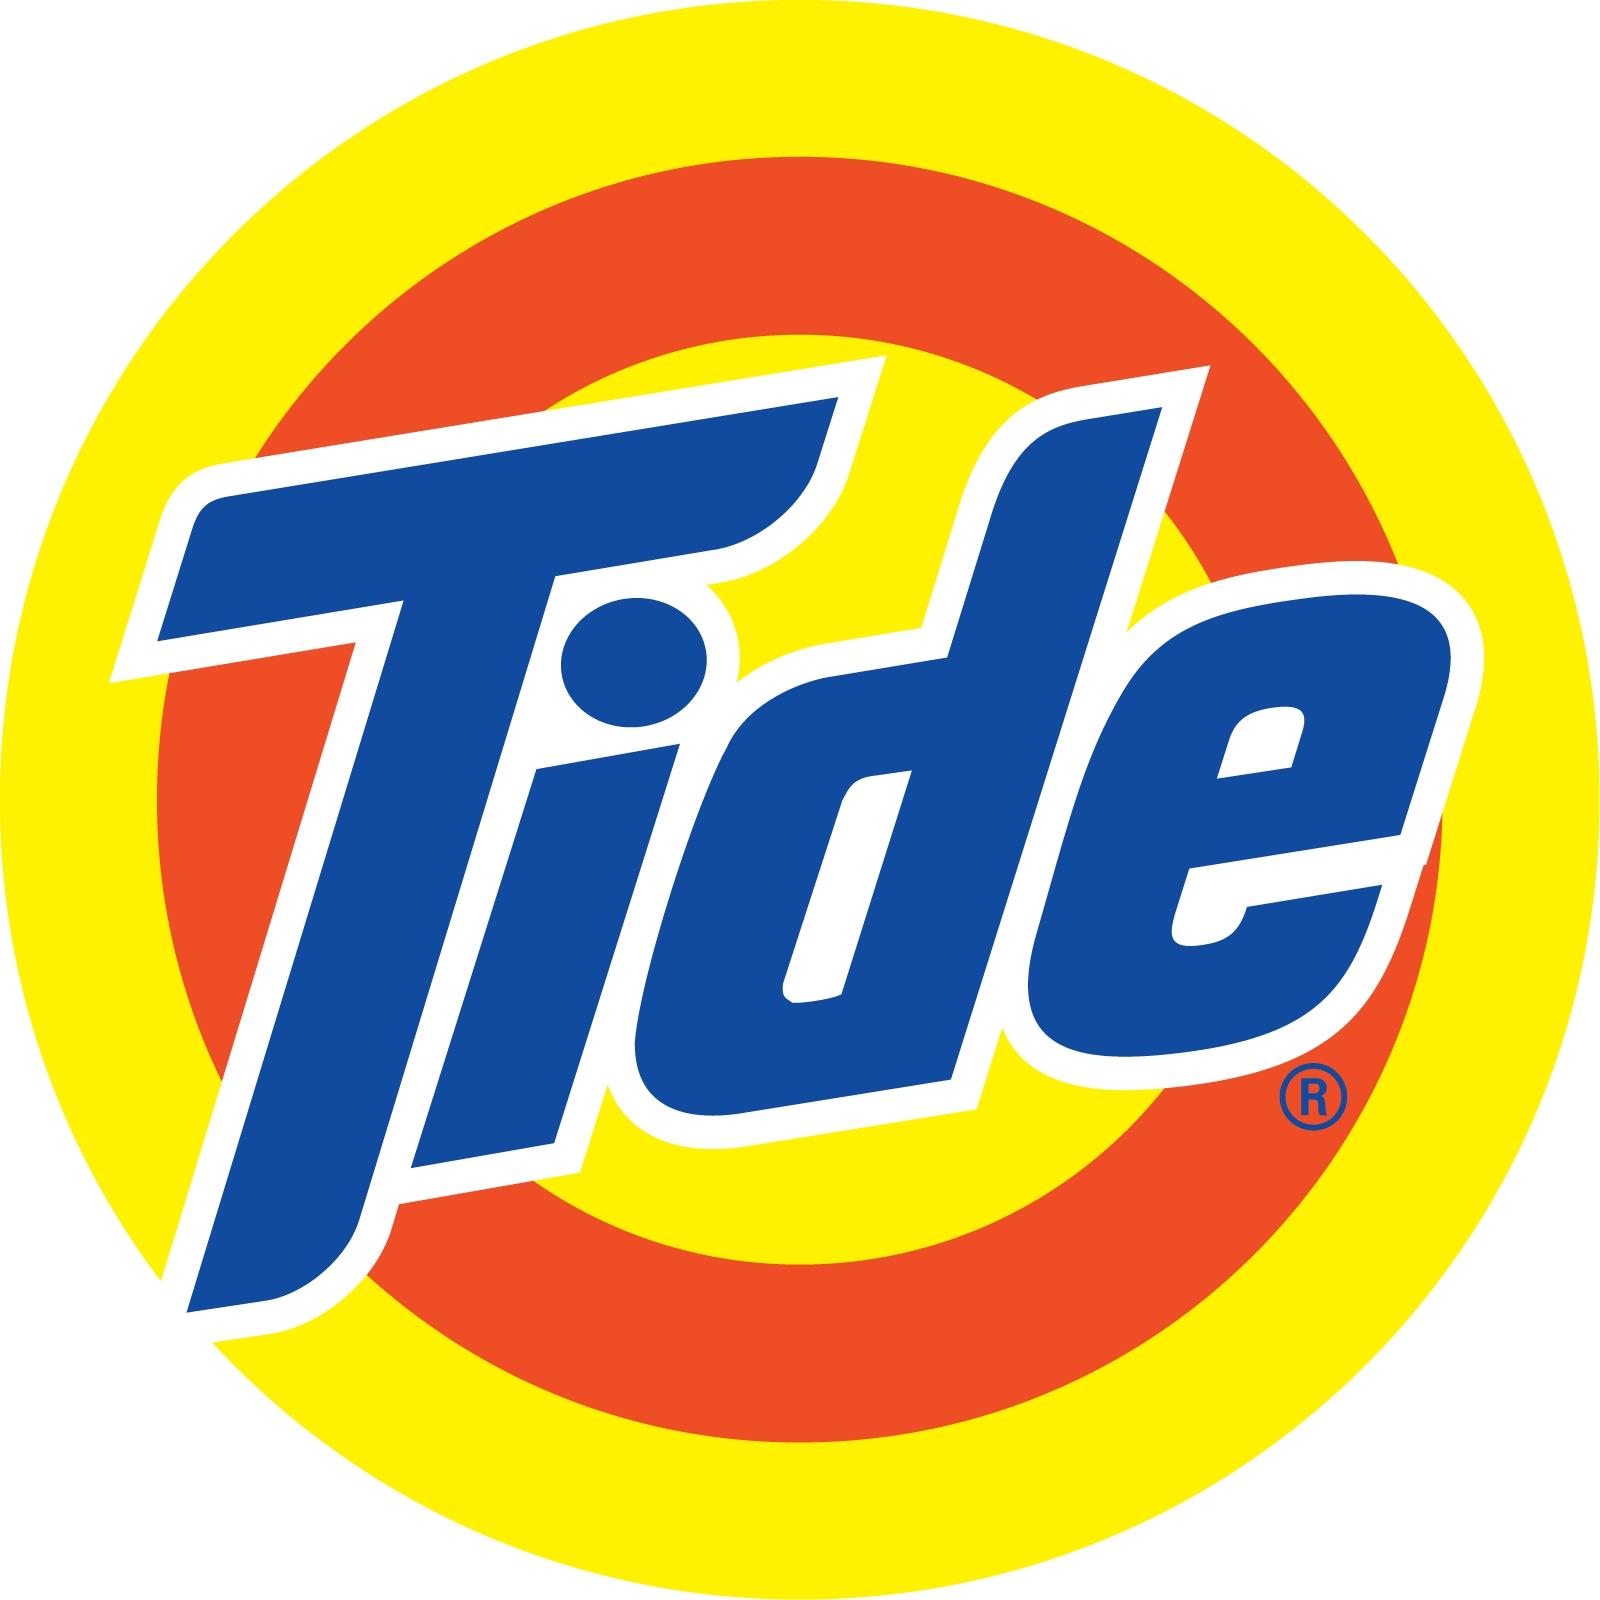 Home Design Company In Dubai Tide 174 Launches New Eco Friendly Detergent Tide Purclean